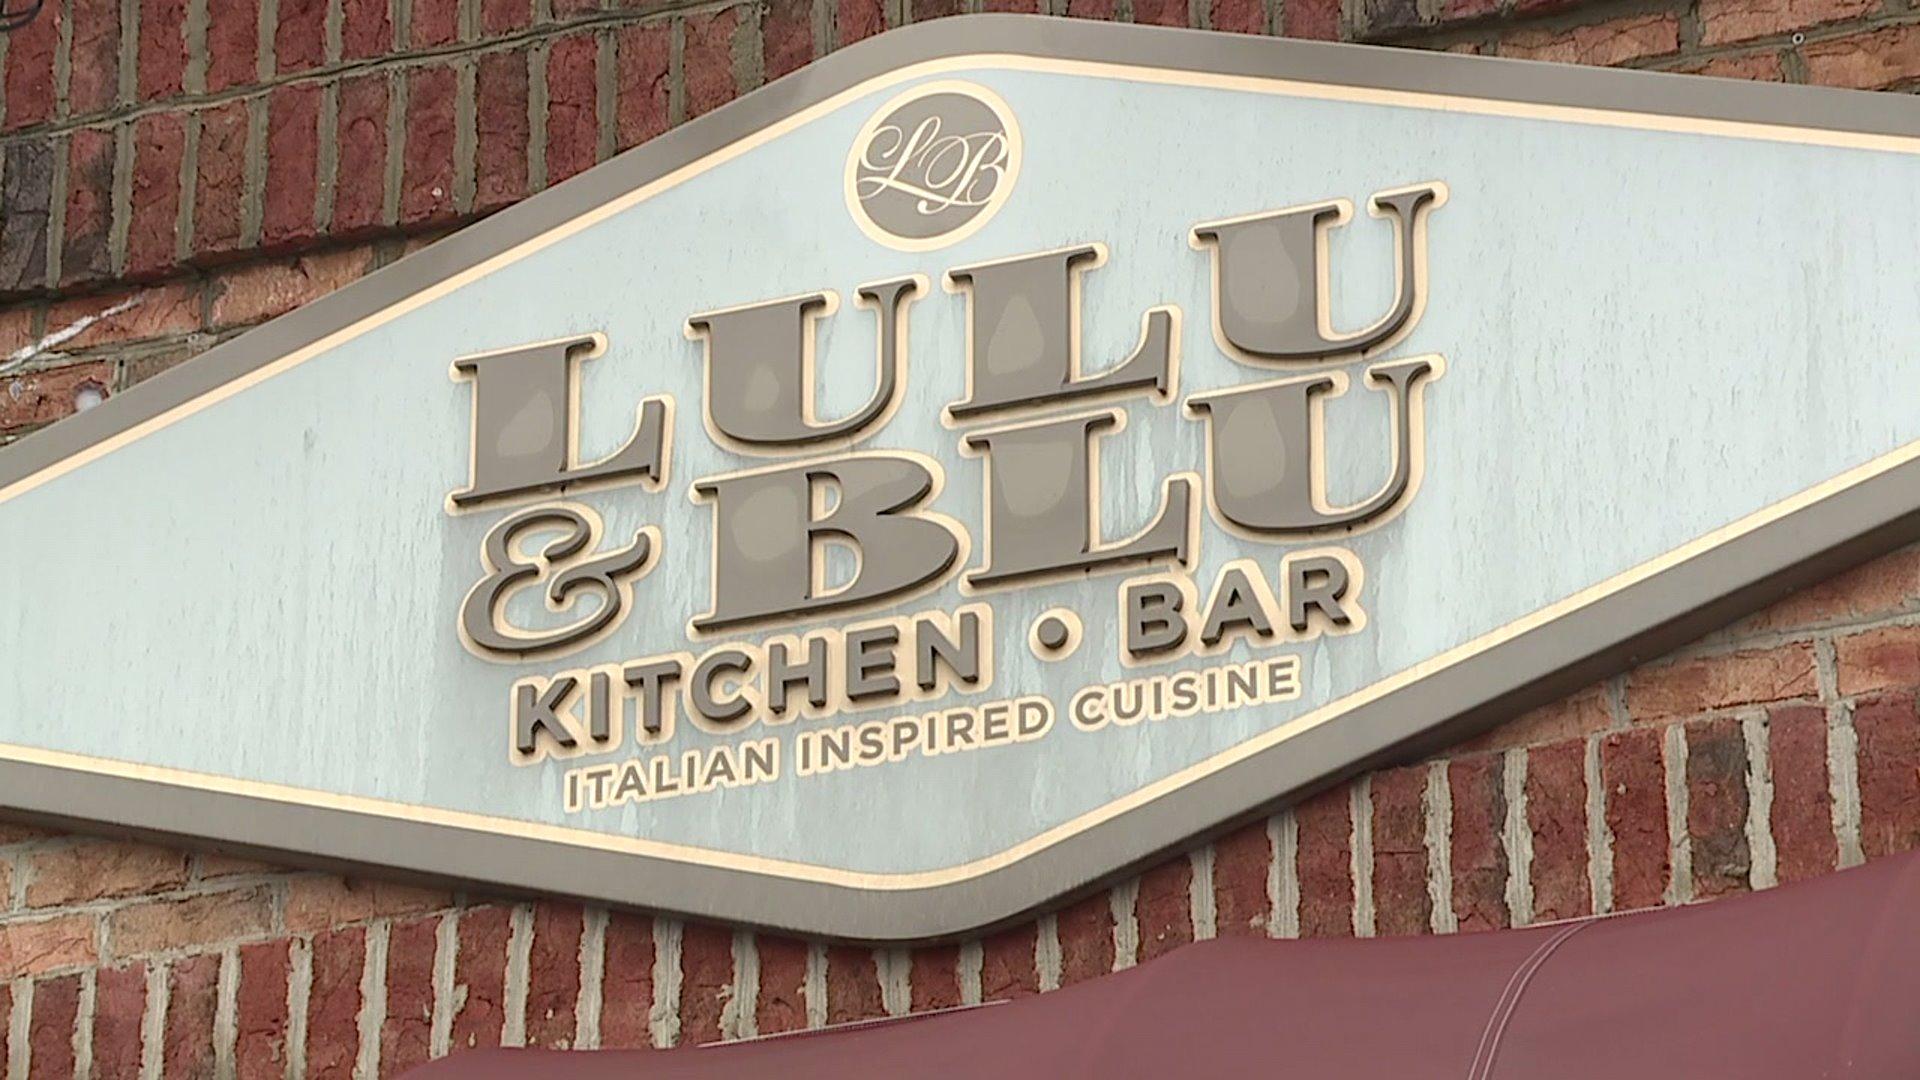 Lulu & Blu